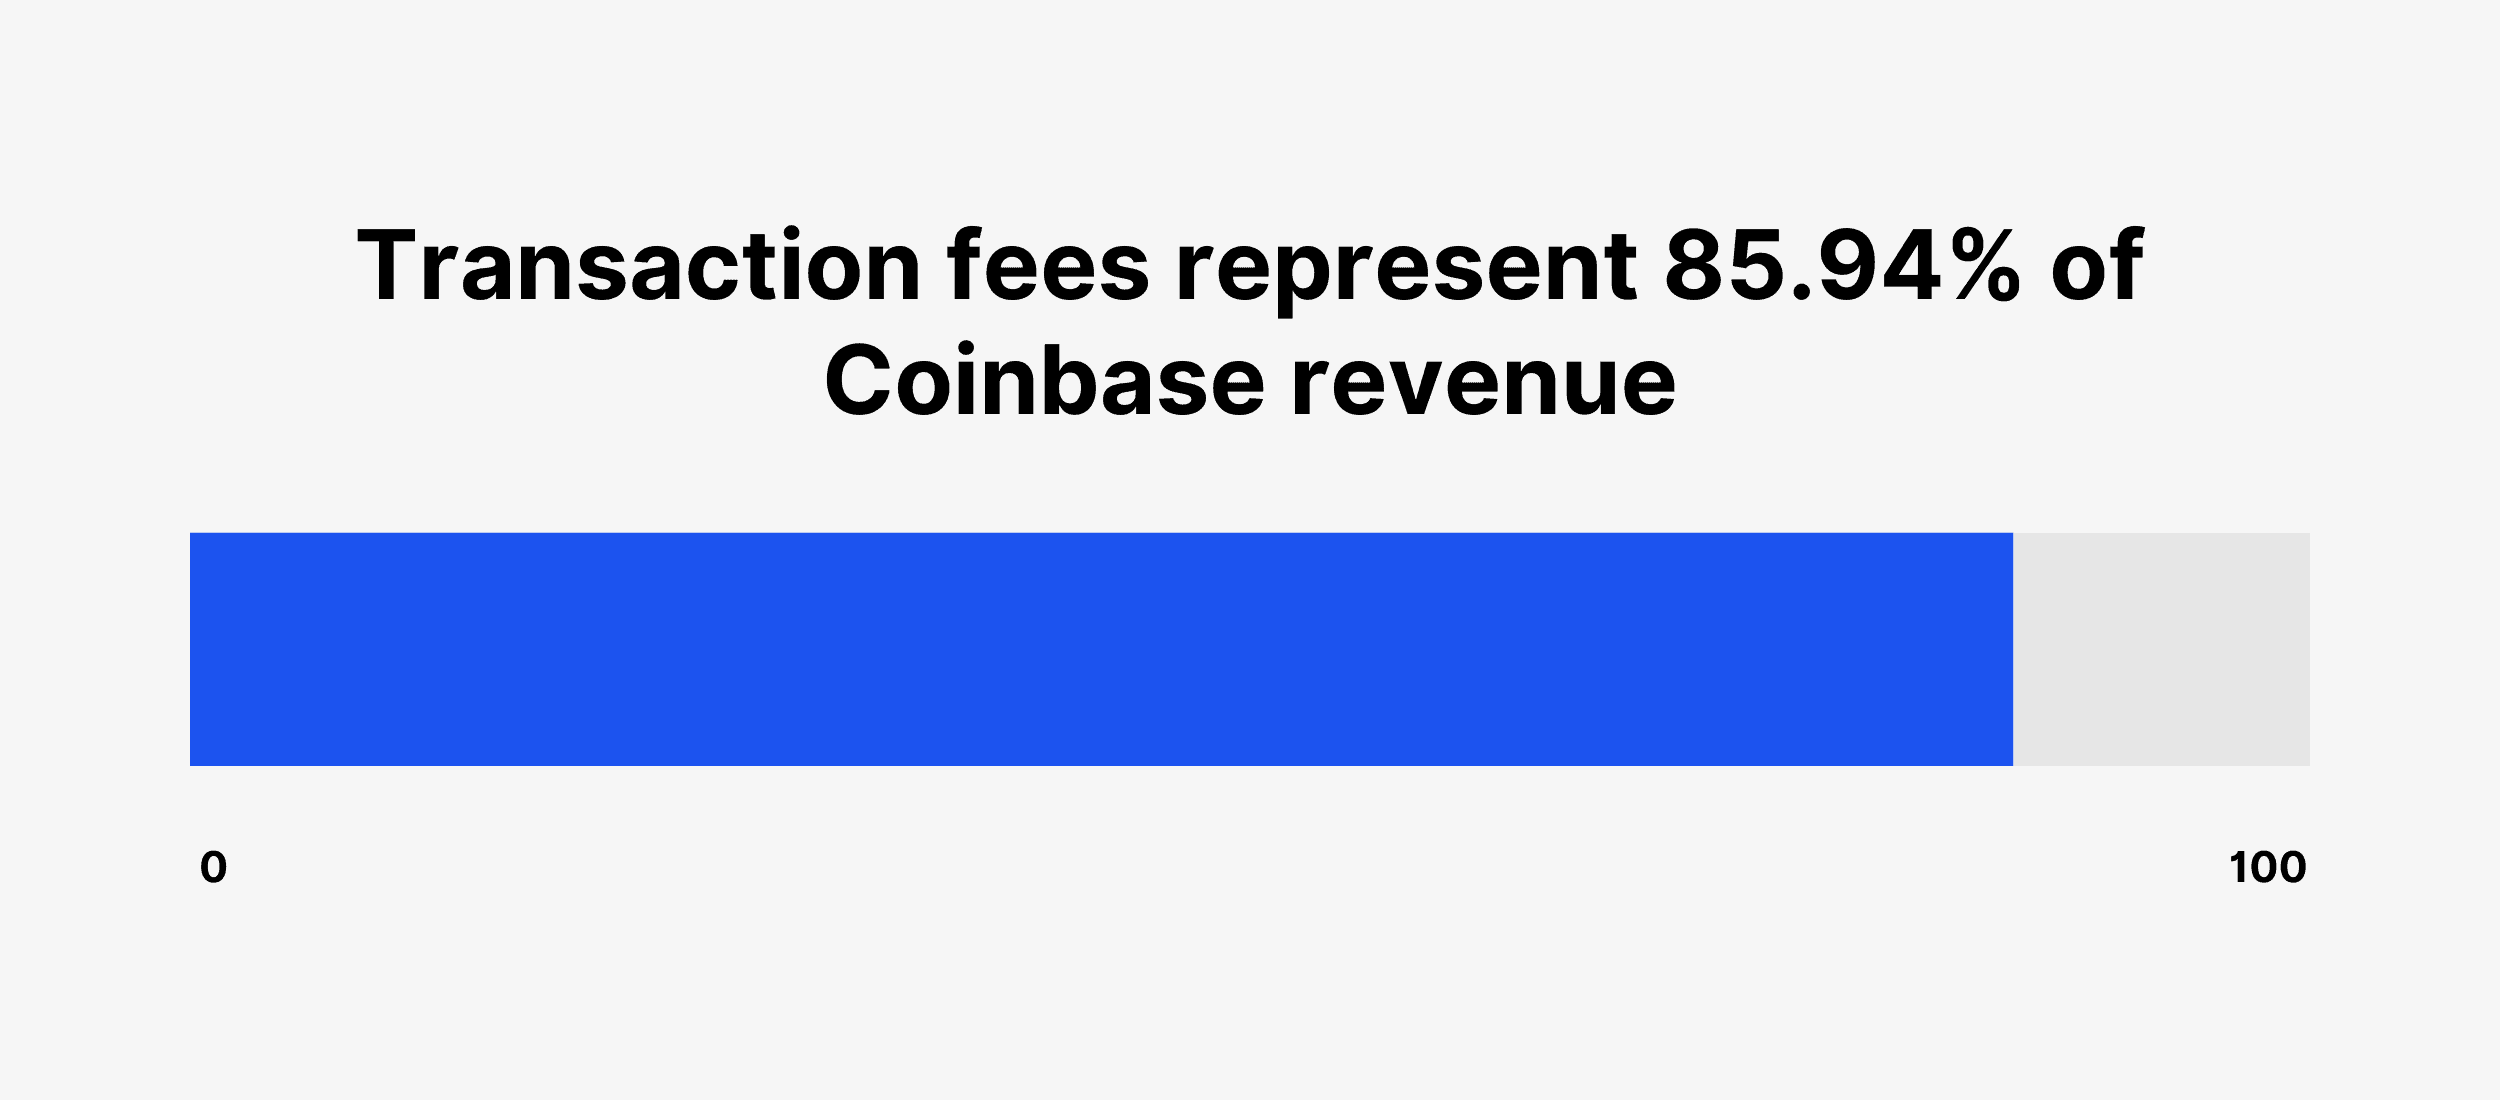 Transaction fees represent 85.94% of Coinbase revenue